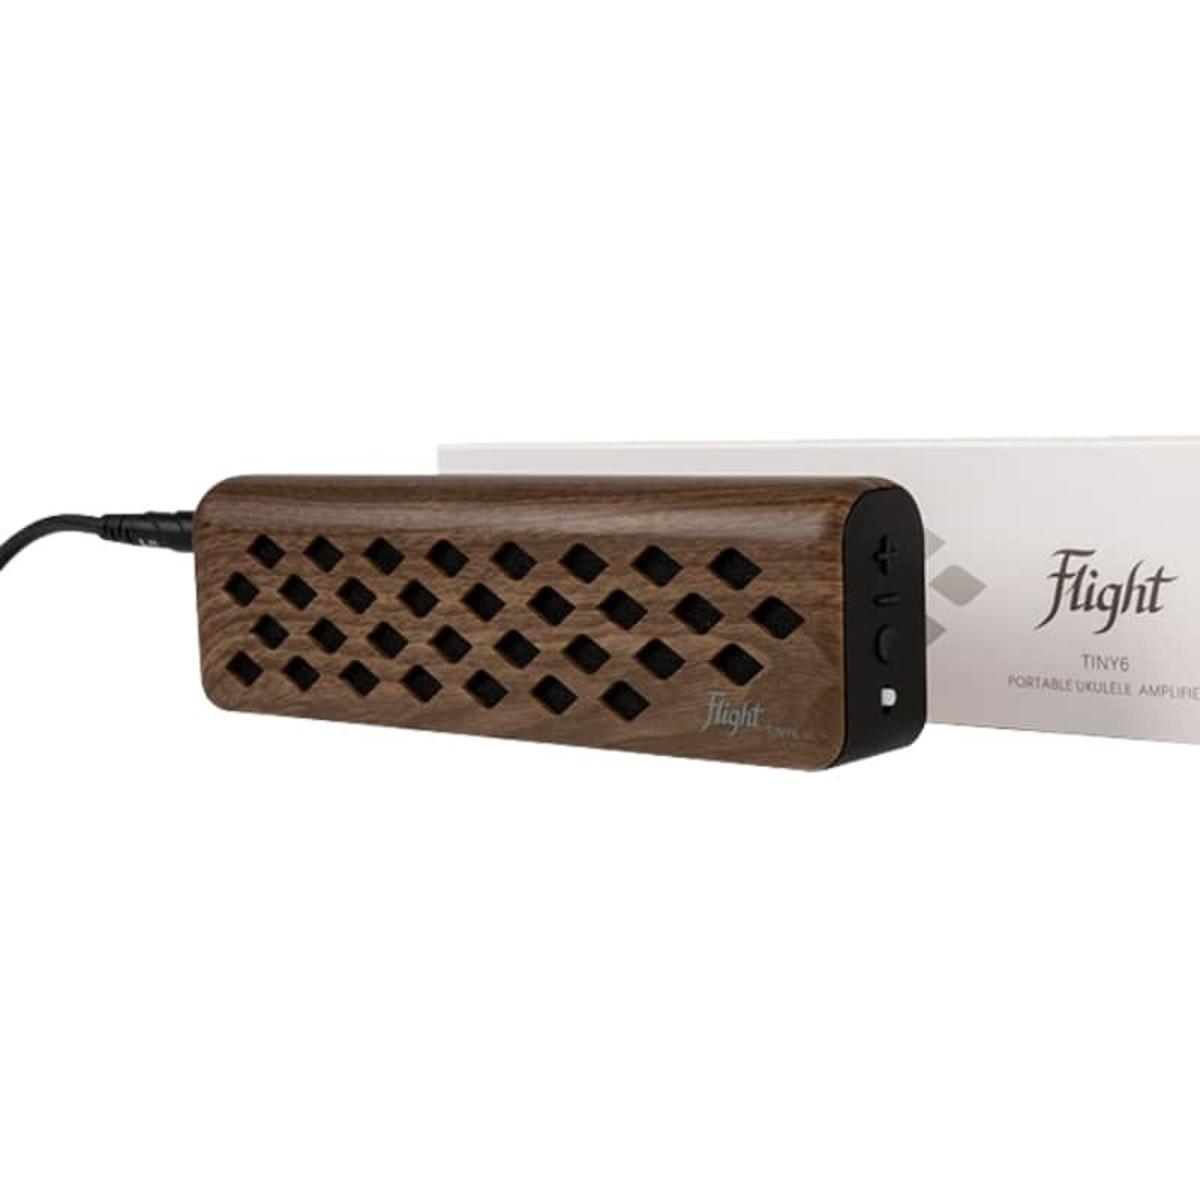 Flight Tiny 6 mini - Amplificador acústico con bluetooth